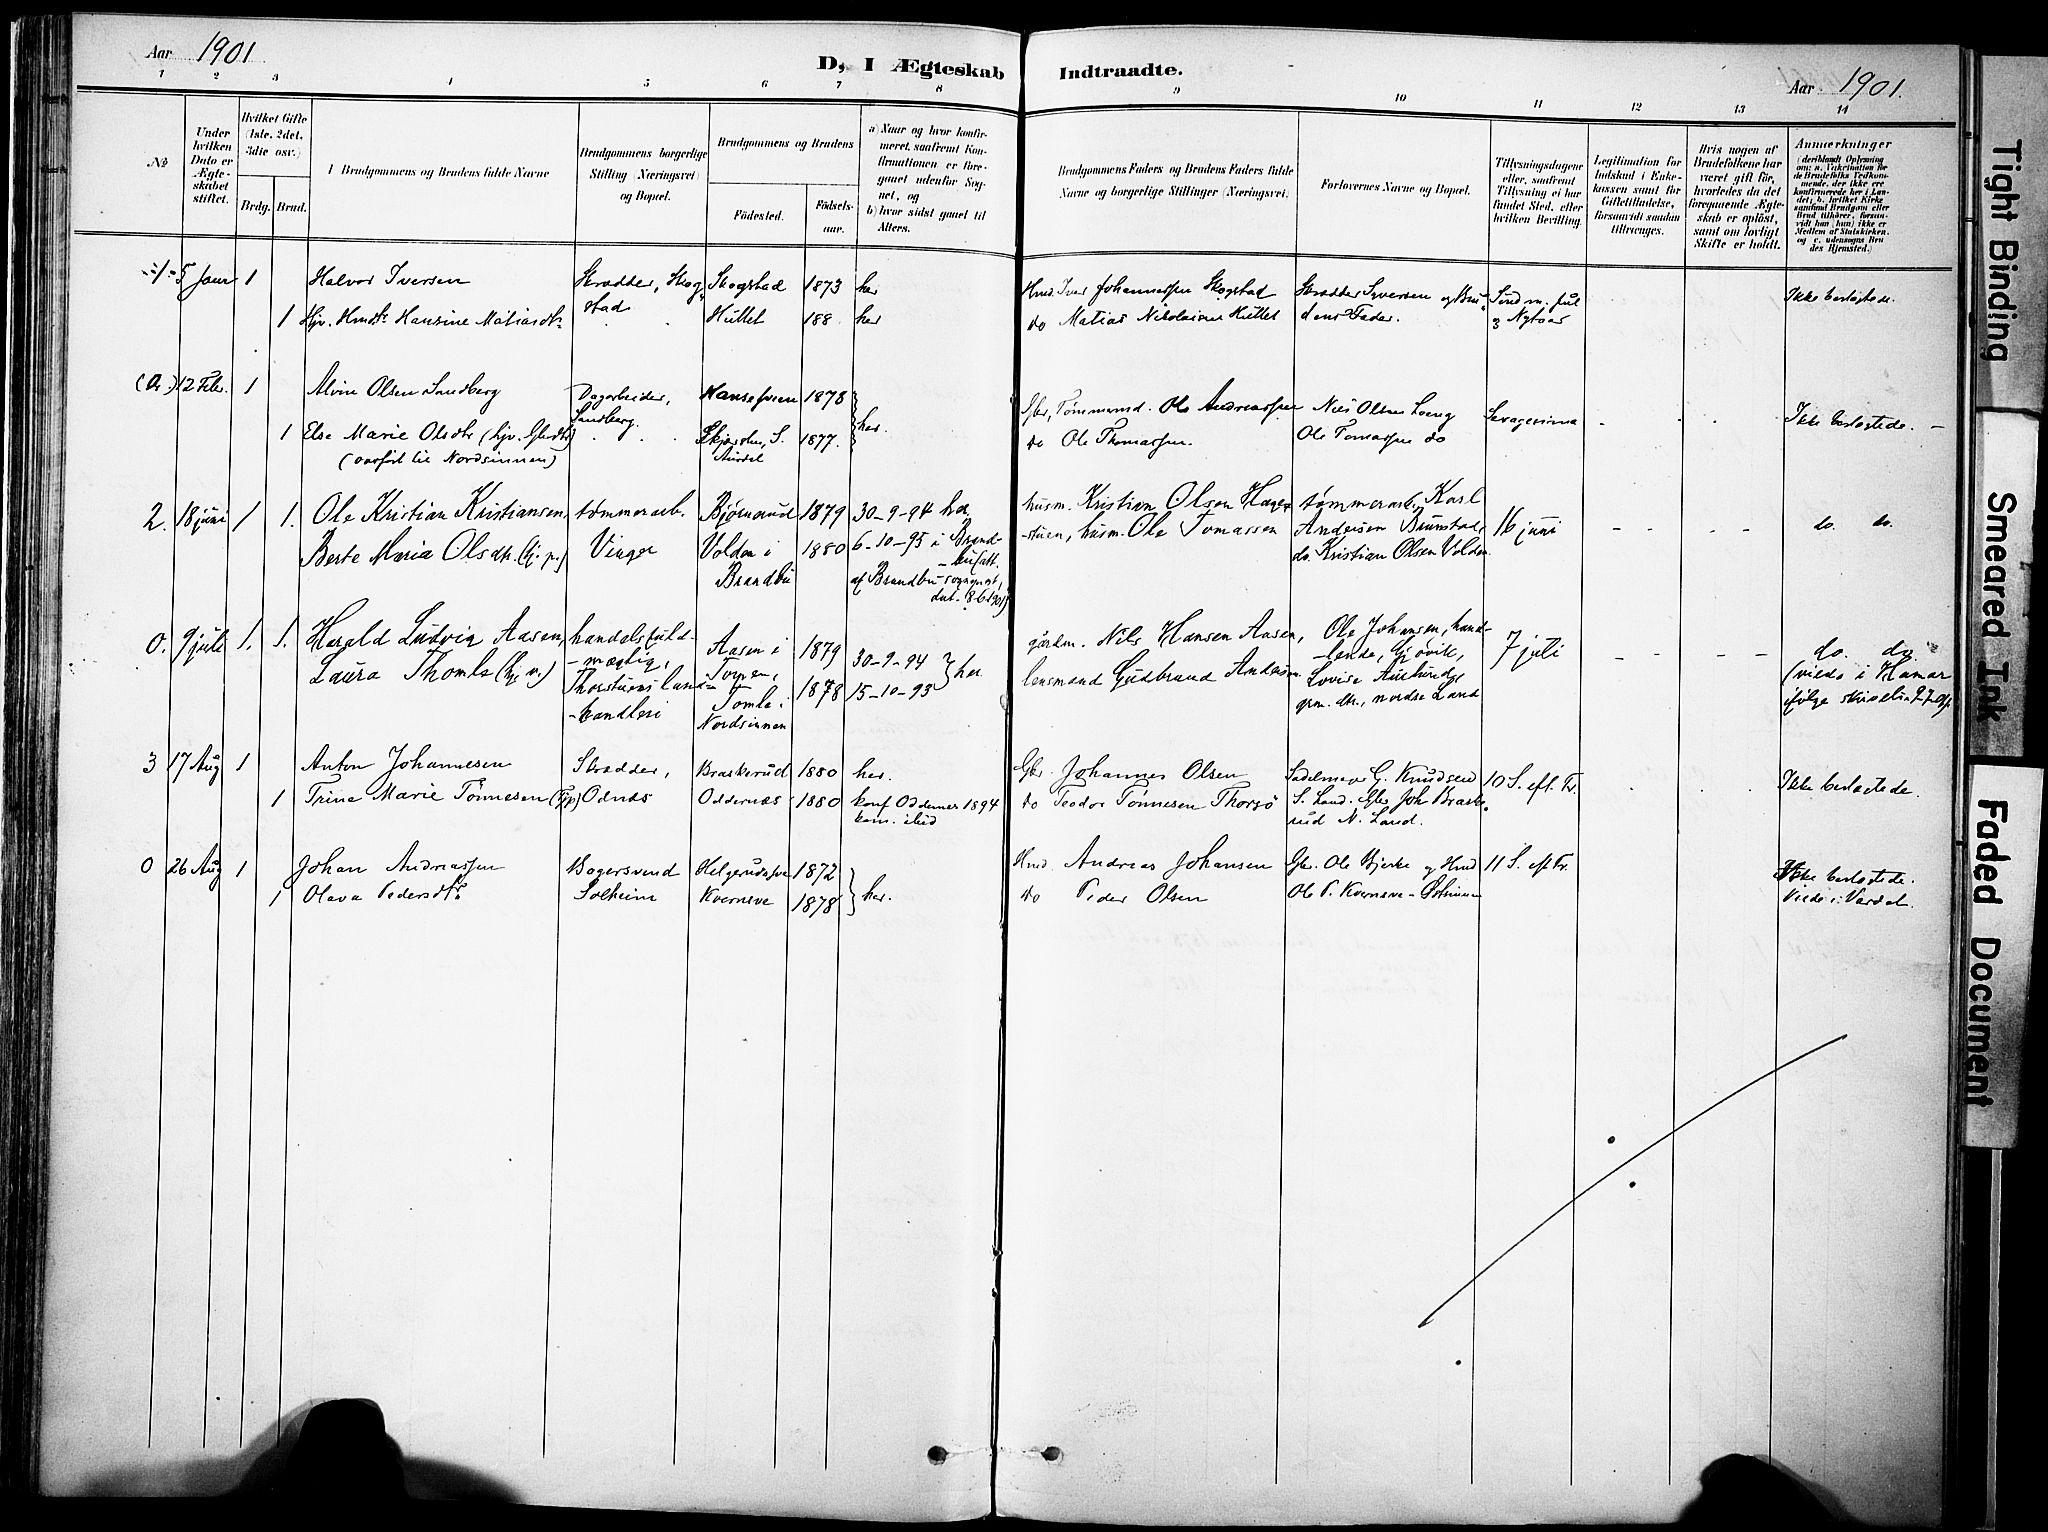 SAH, Nordre Land prestekontor, Ministerialbok nr. 6, 1897-1914, s. 91b